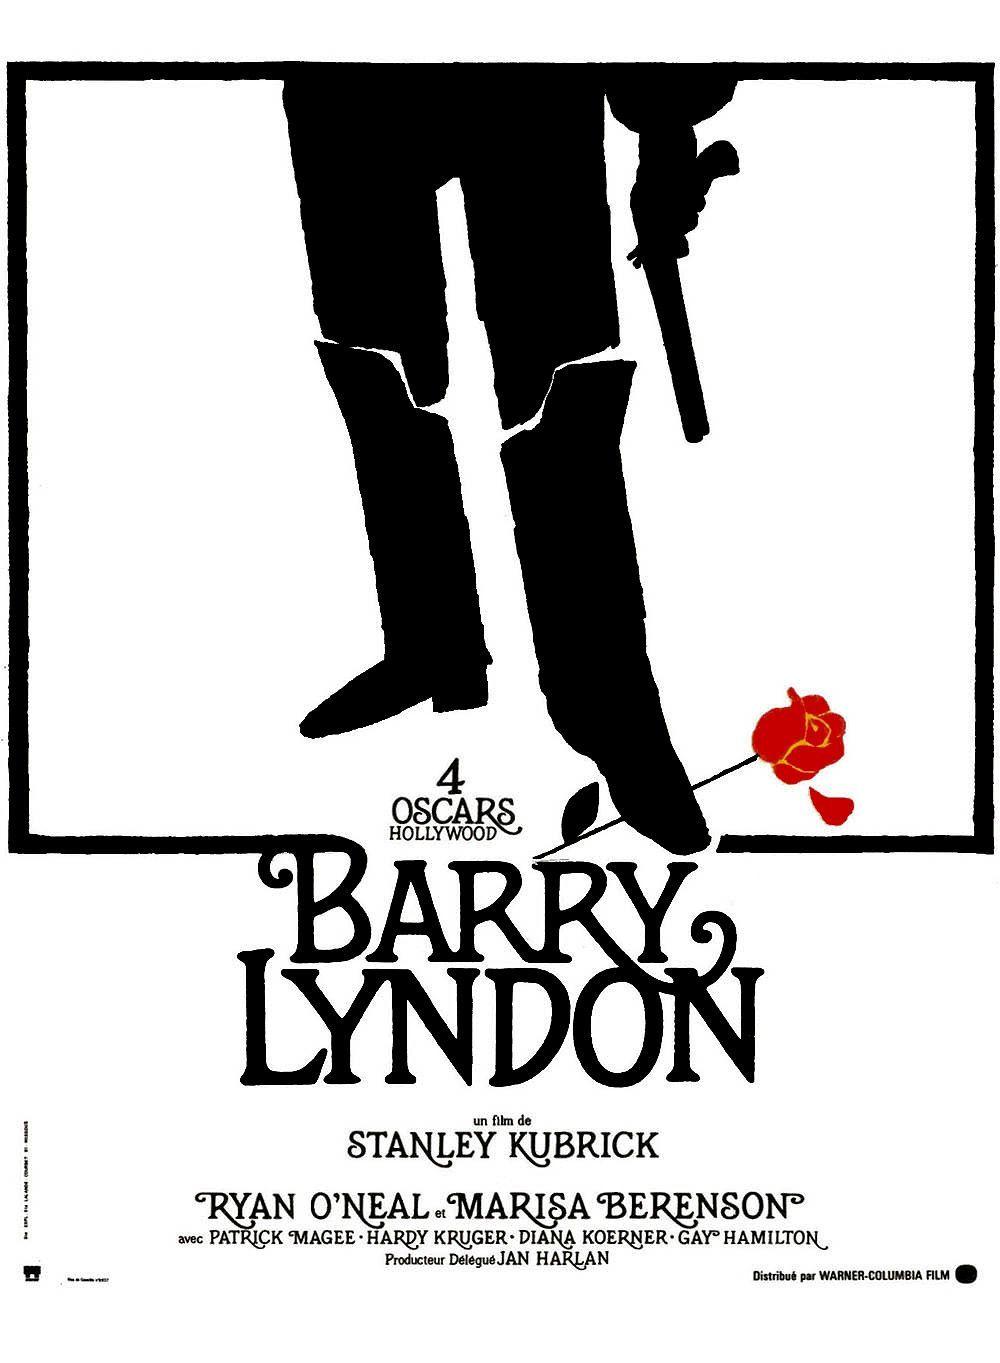 Barry Lyndon (1975) de Stanley Kubrick